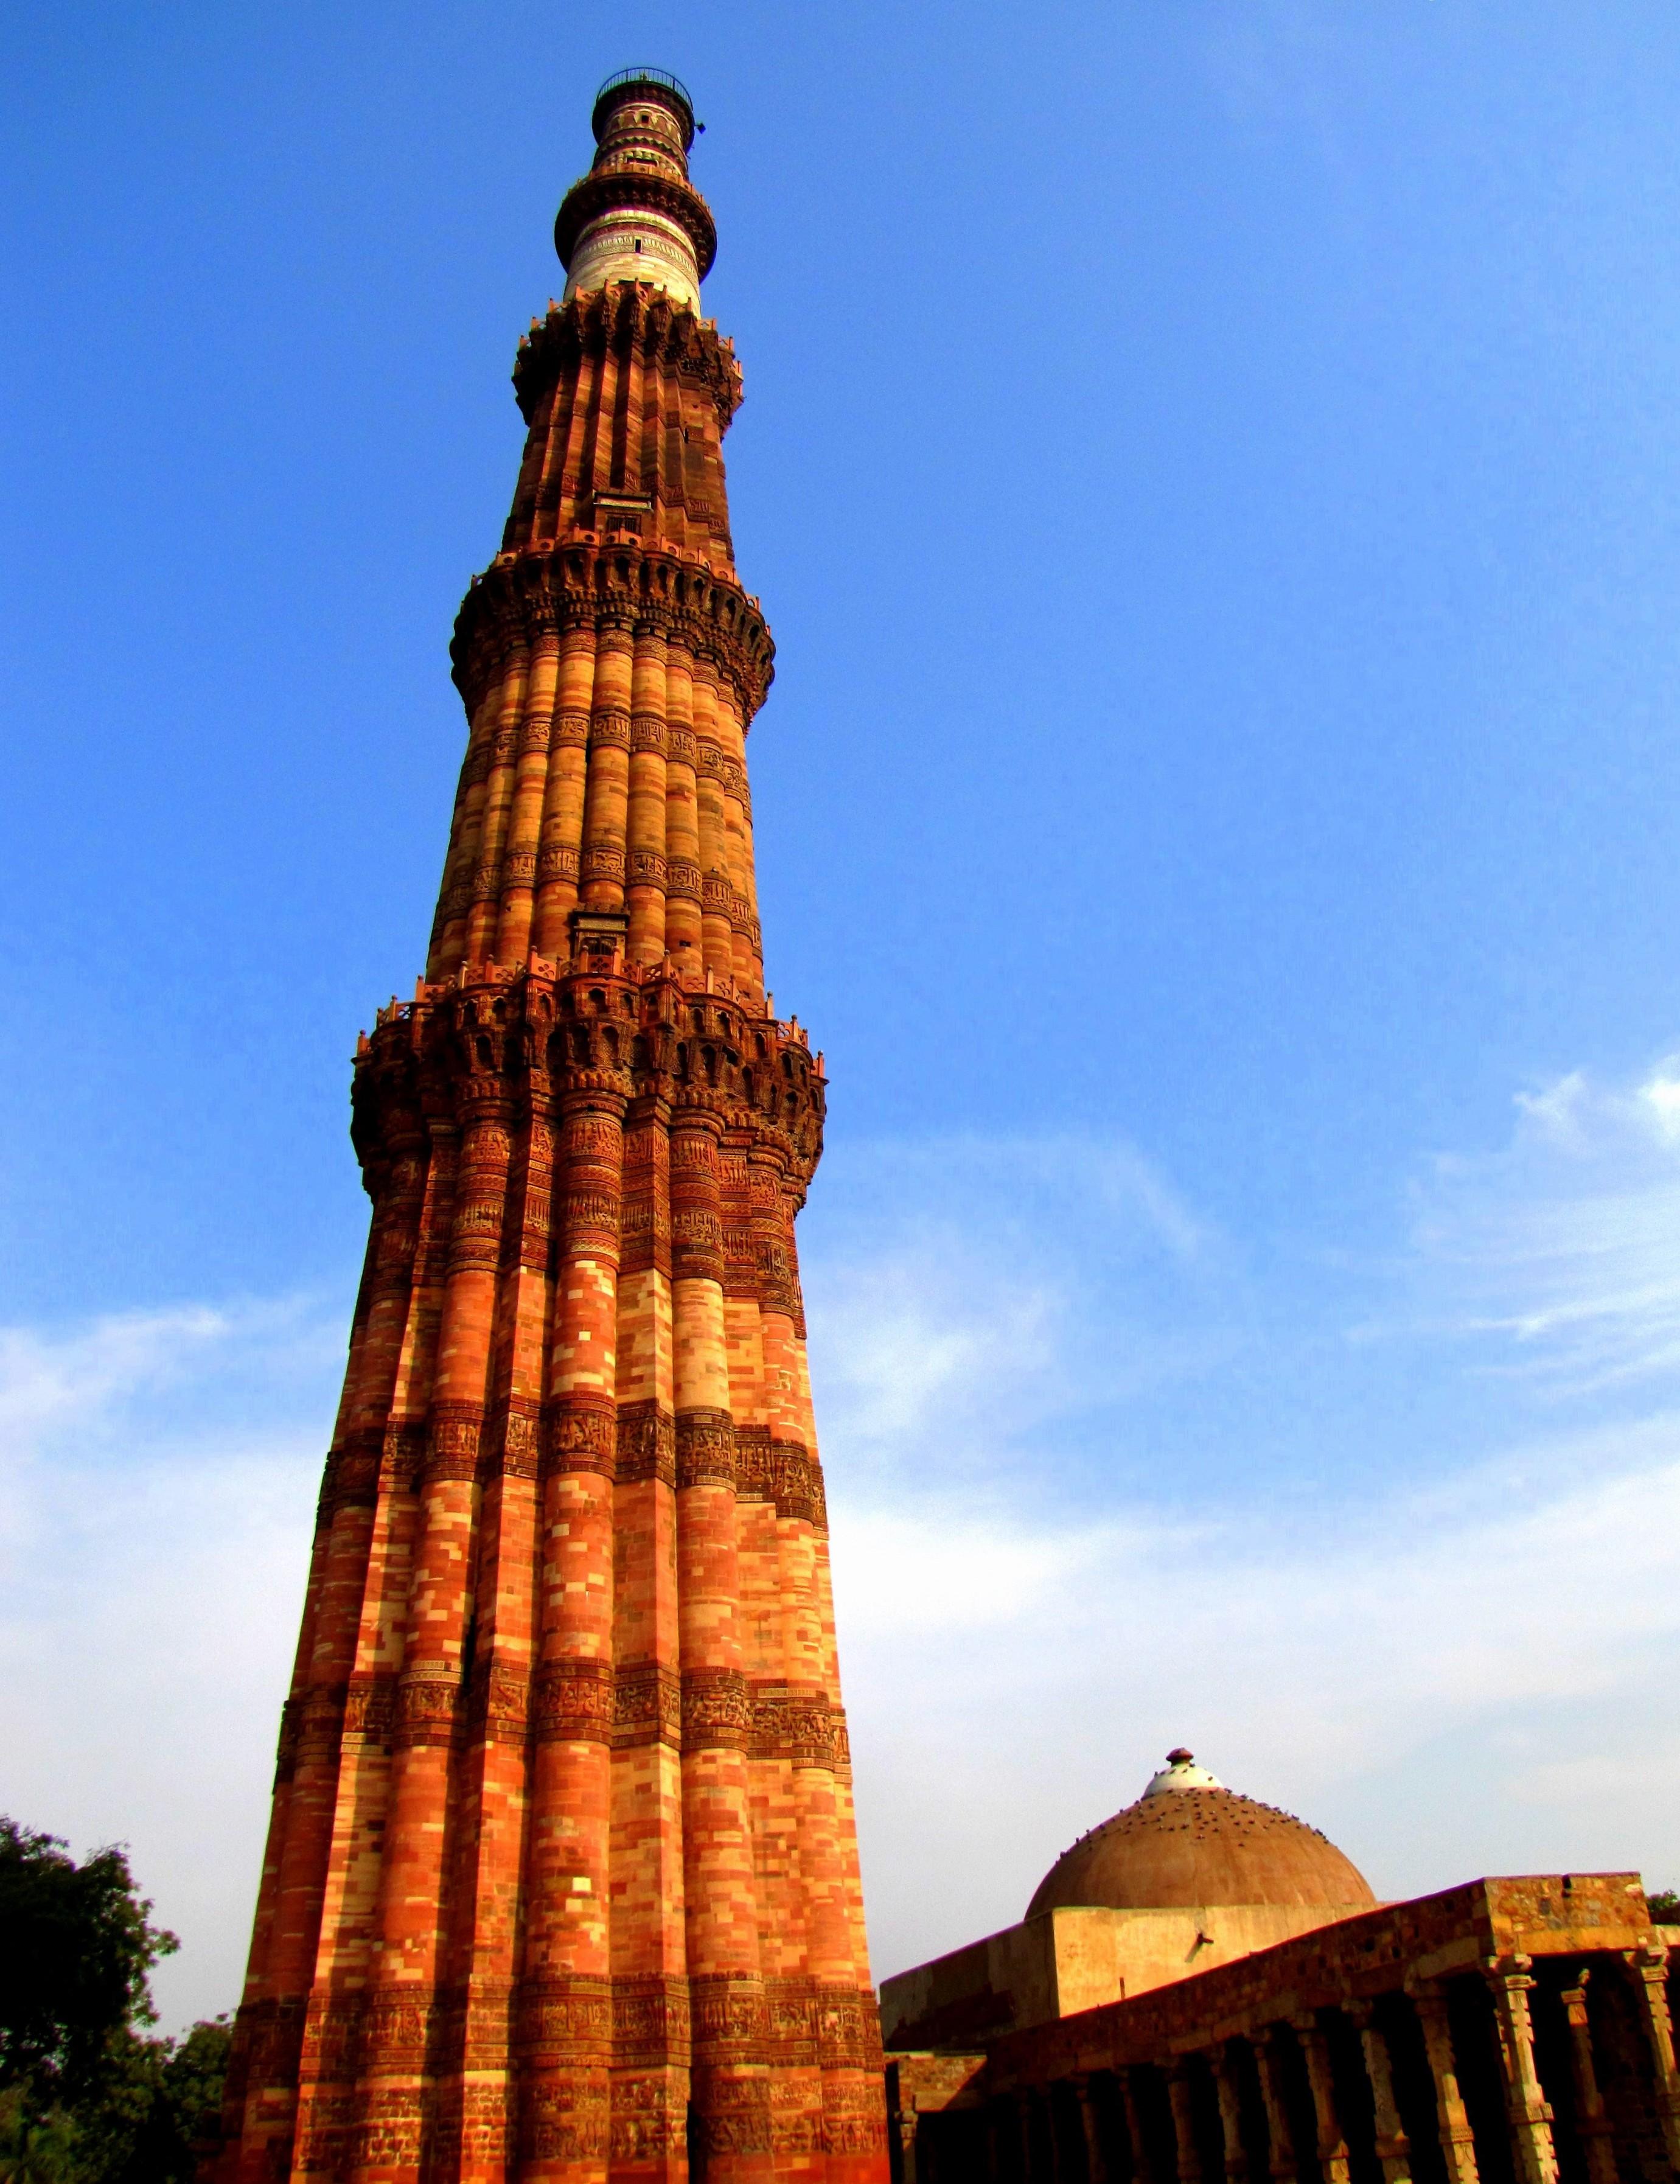 File:Qutub Minar New Delhi.JPG - Wikimedia Commons